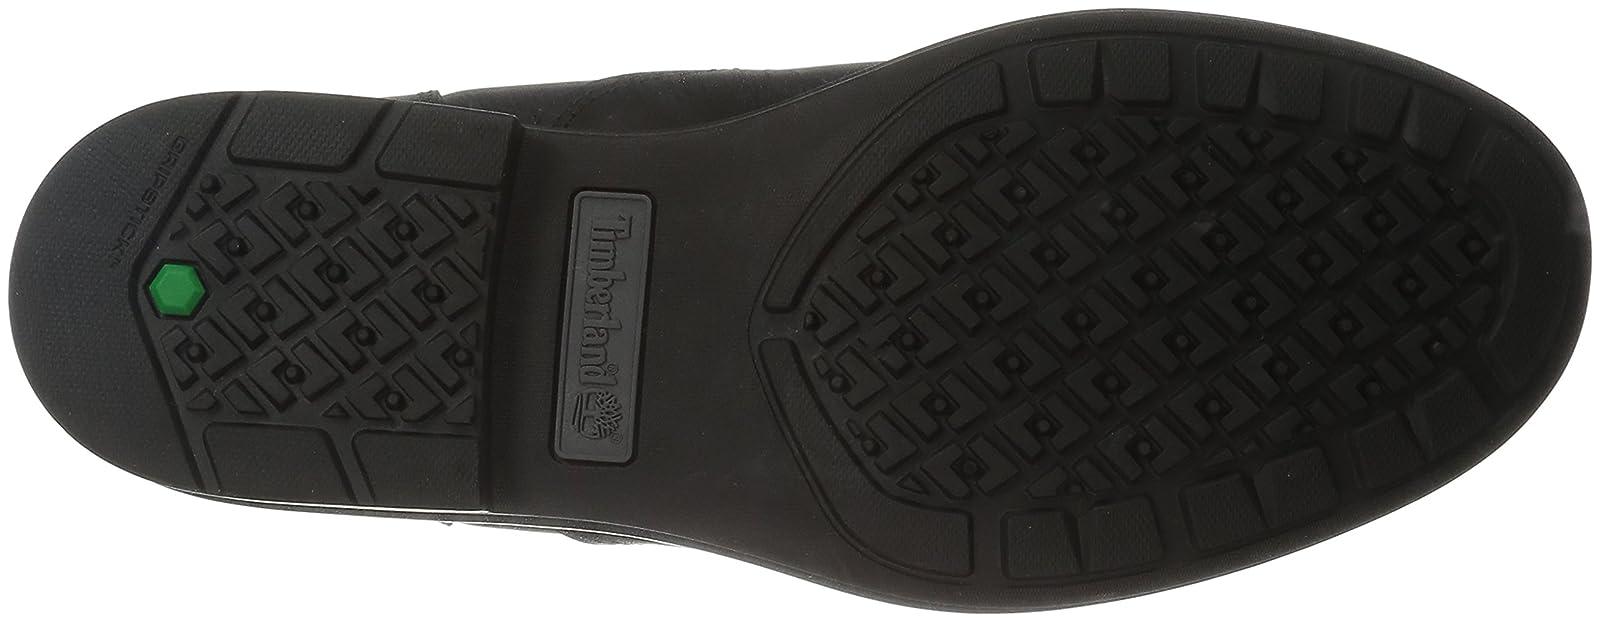 Timberland Men's Carter Notch PT Chelsea Boot 8 M US - 3